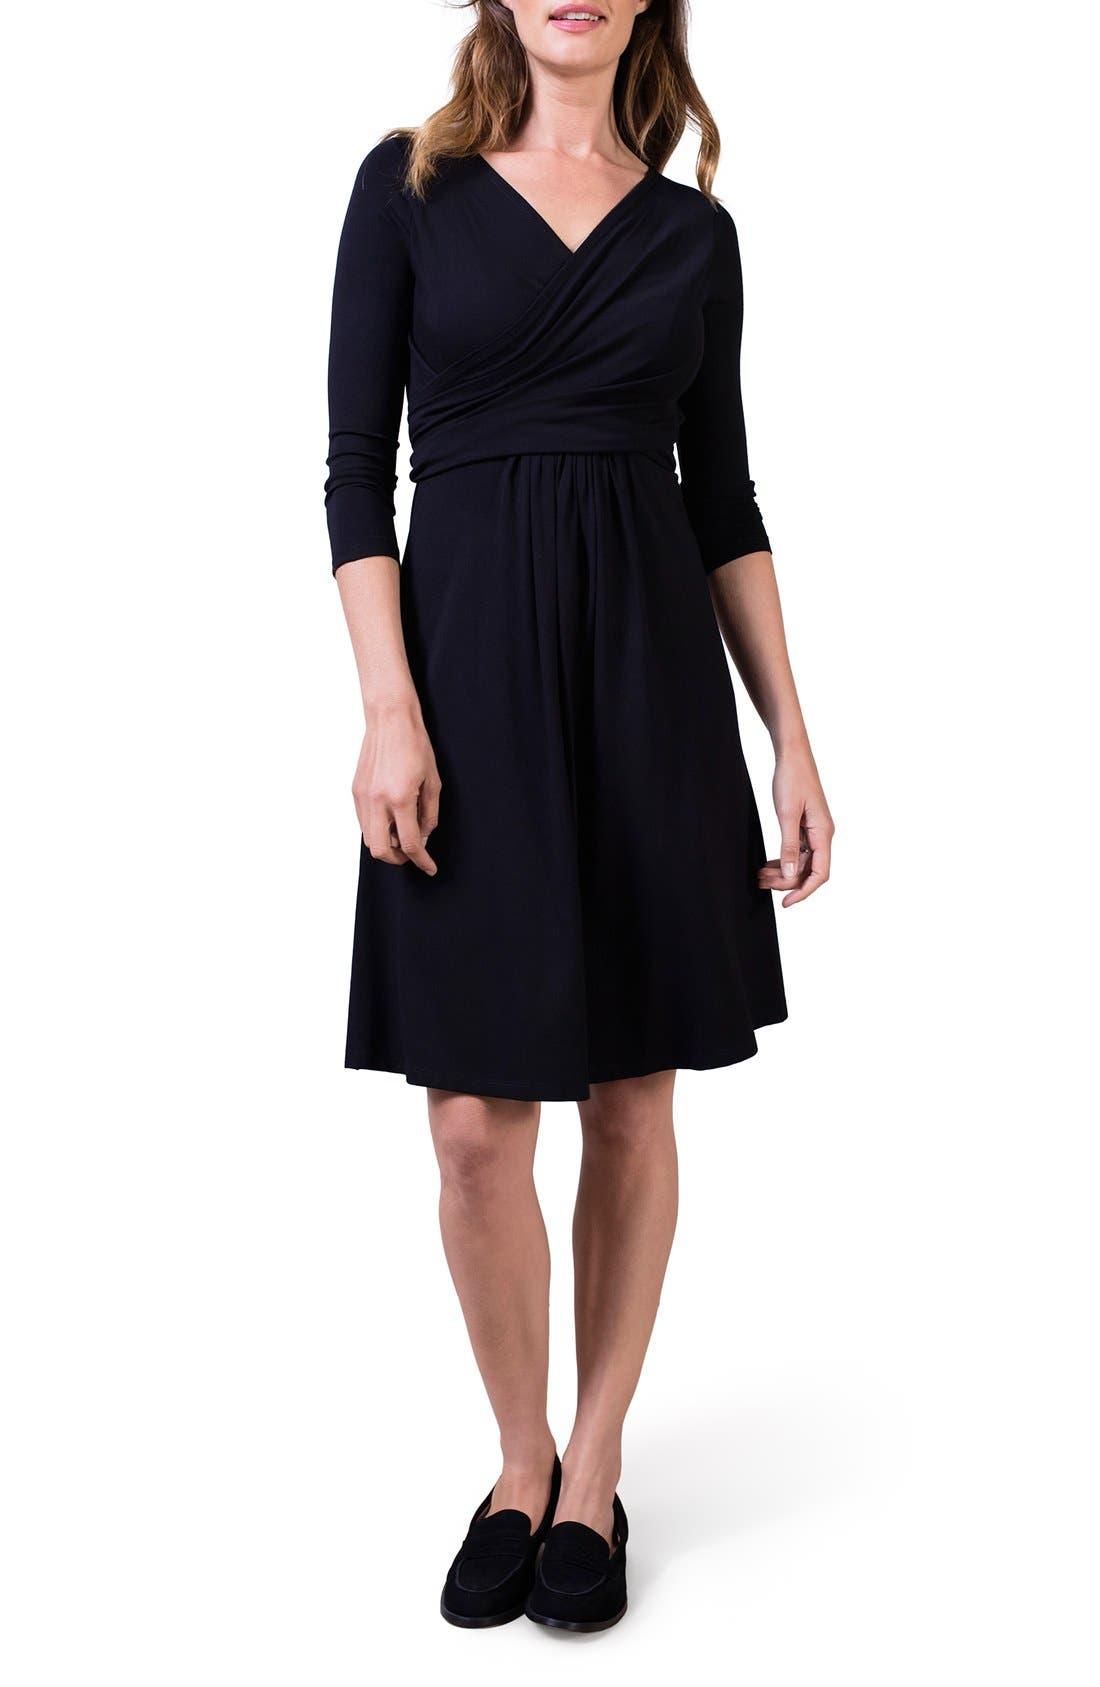 ISABELLA OLIVER,                             'Avebury' Nursing Wrap Maternity Dress,                             Alternate thumbnail 3, color,                             001